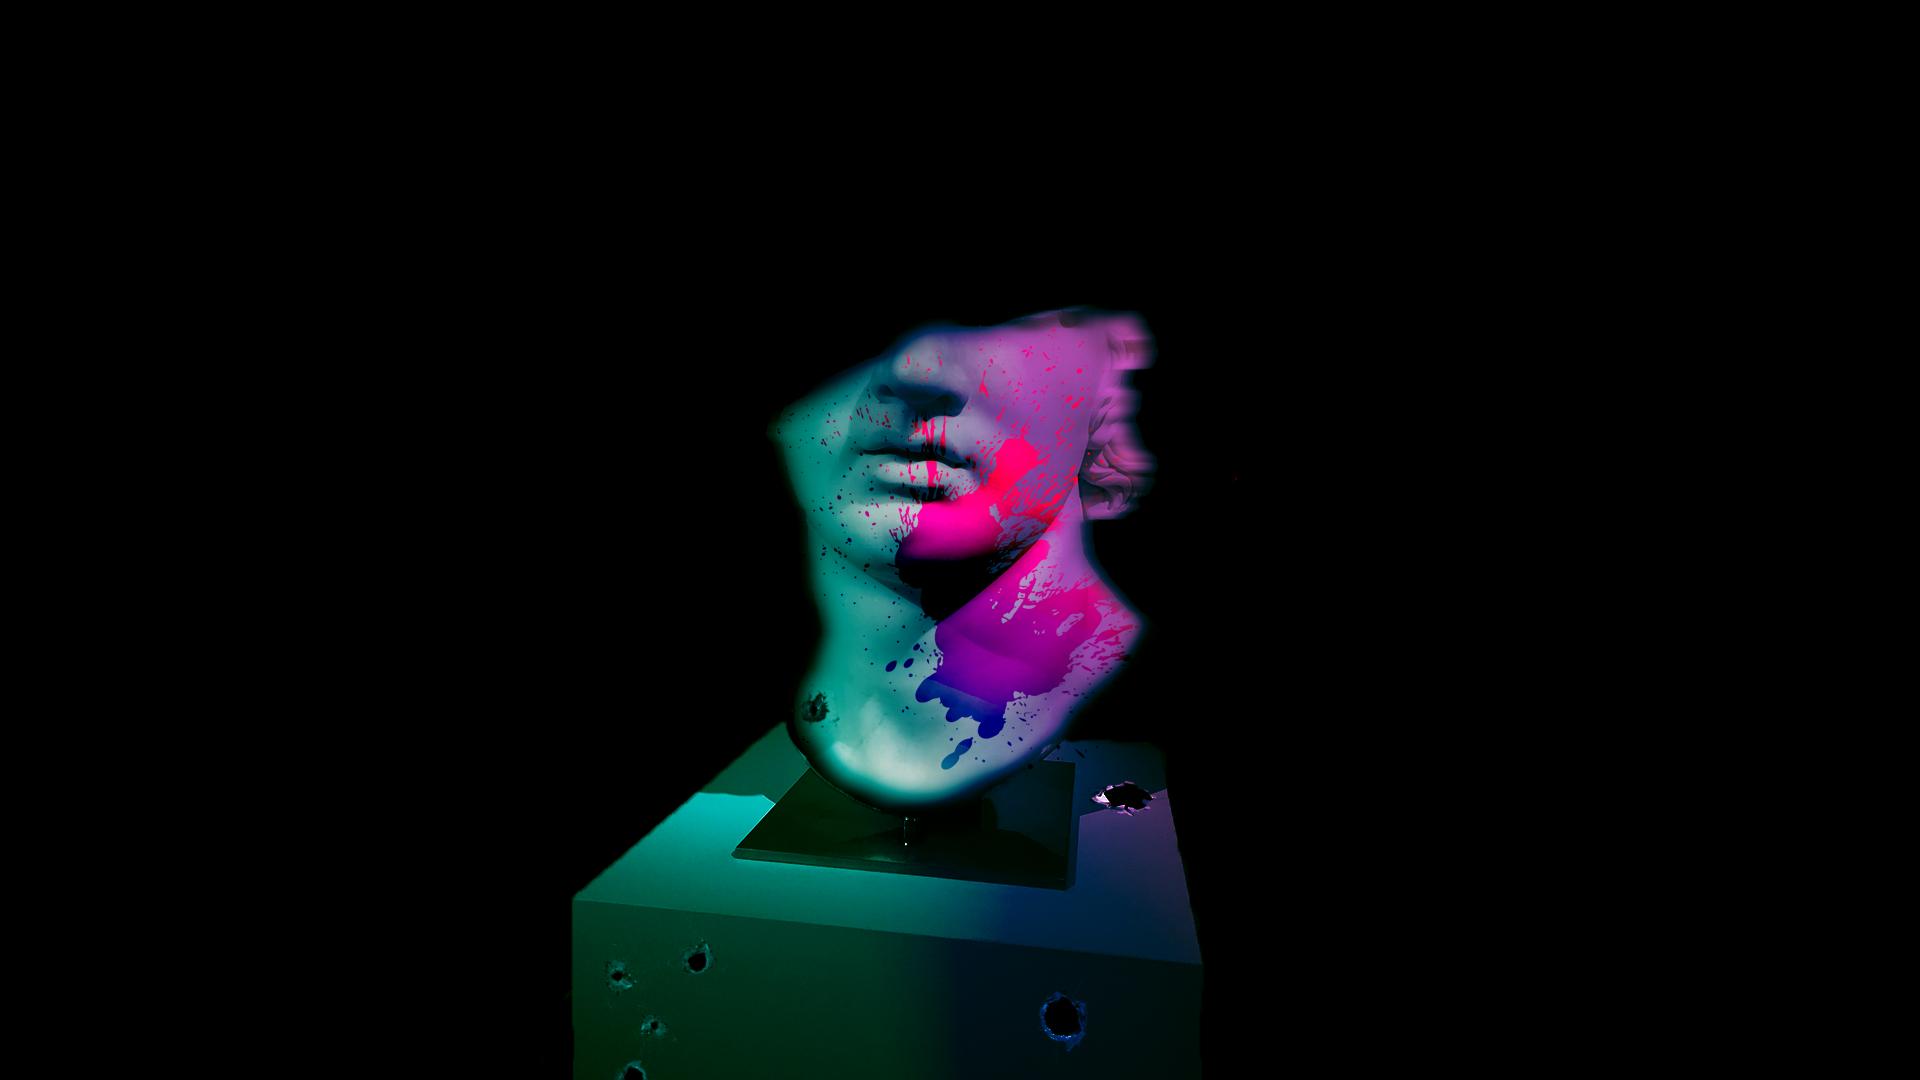 General 1920x1080 statue museum colorful vaporwave